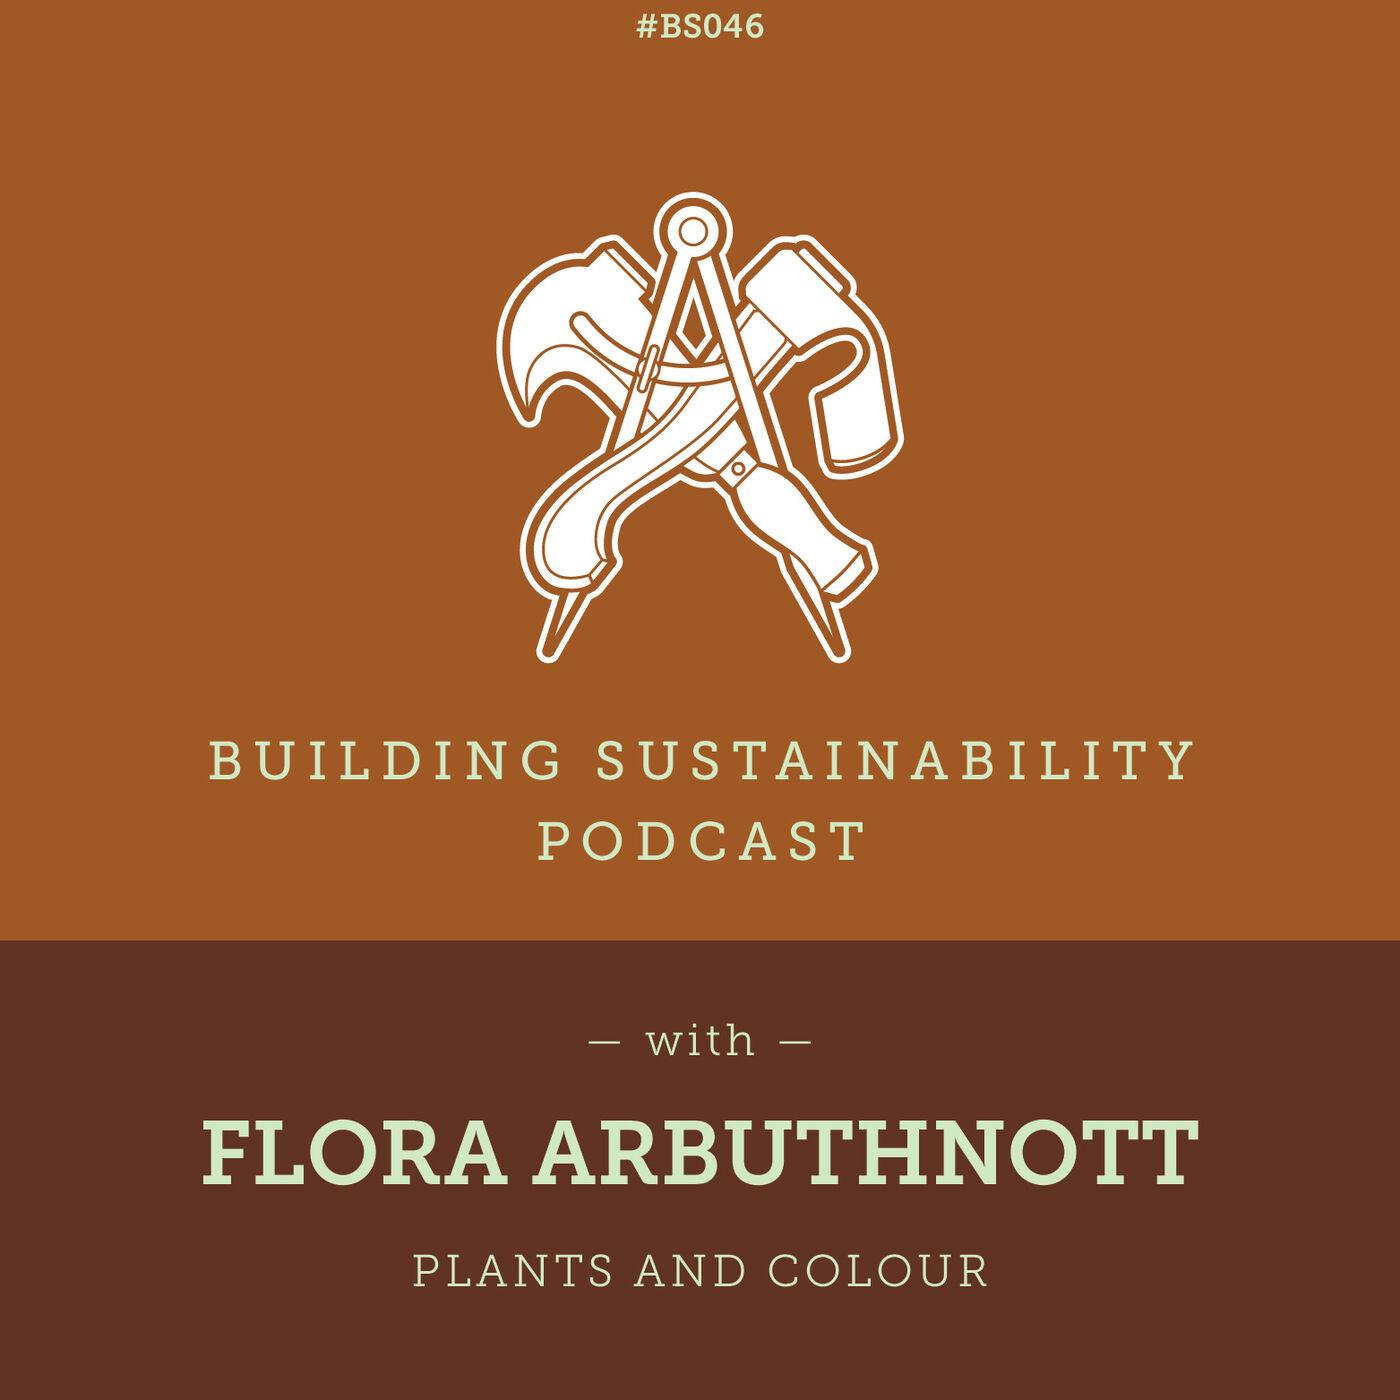 Plants and Colour - Flora Arbuthnott - BS046